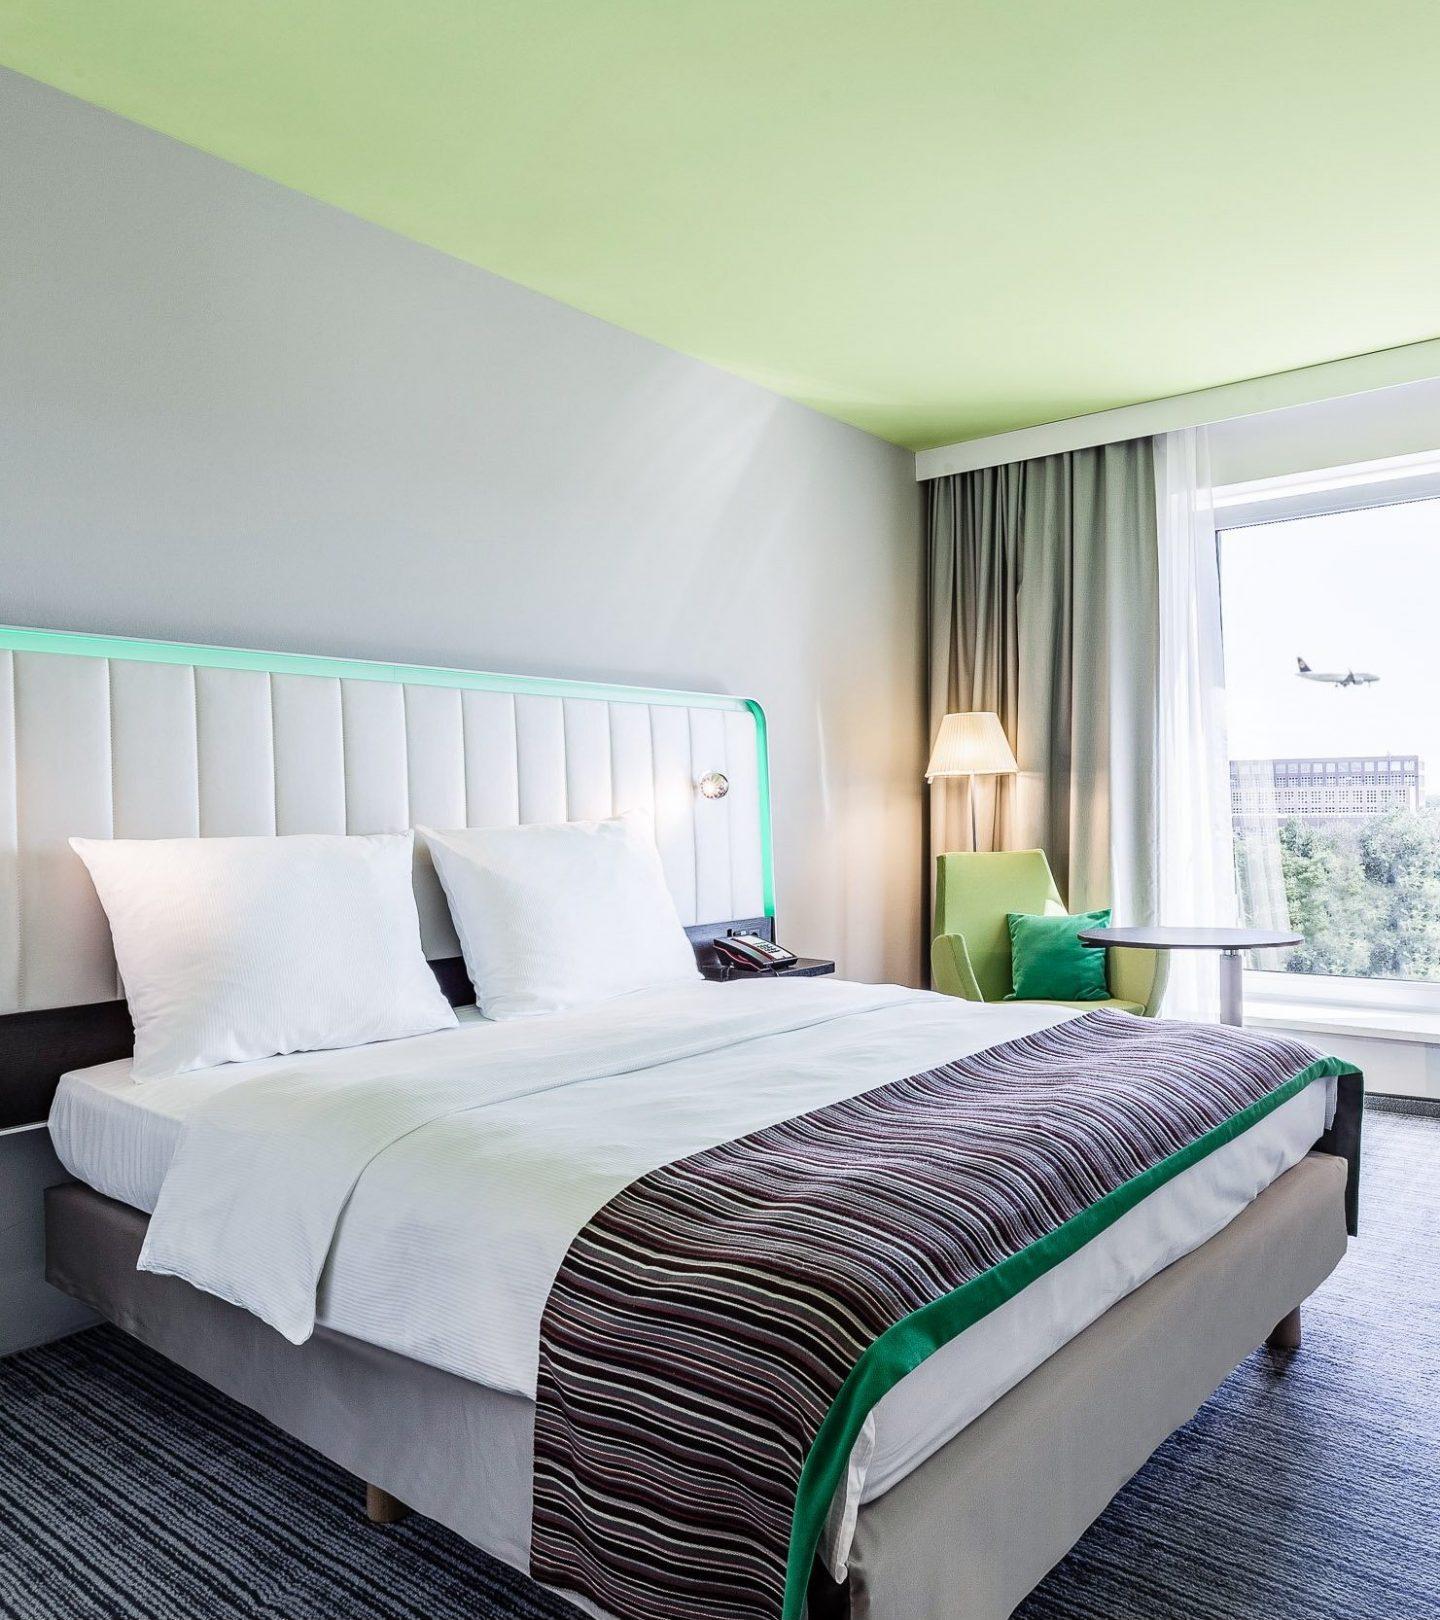 Hotel Park Inn Frankfurt am Main - Innenansicht Hotelzimmer